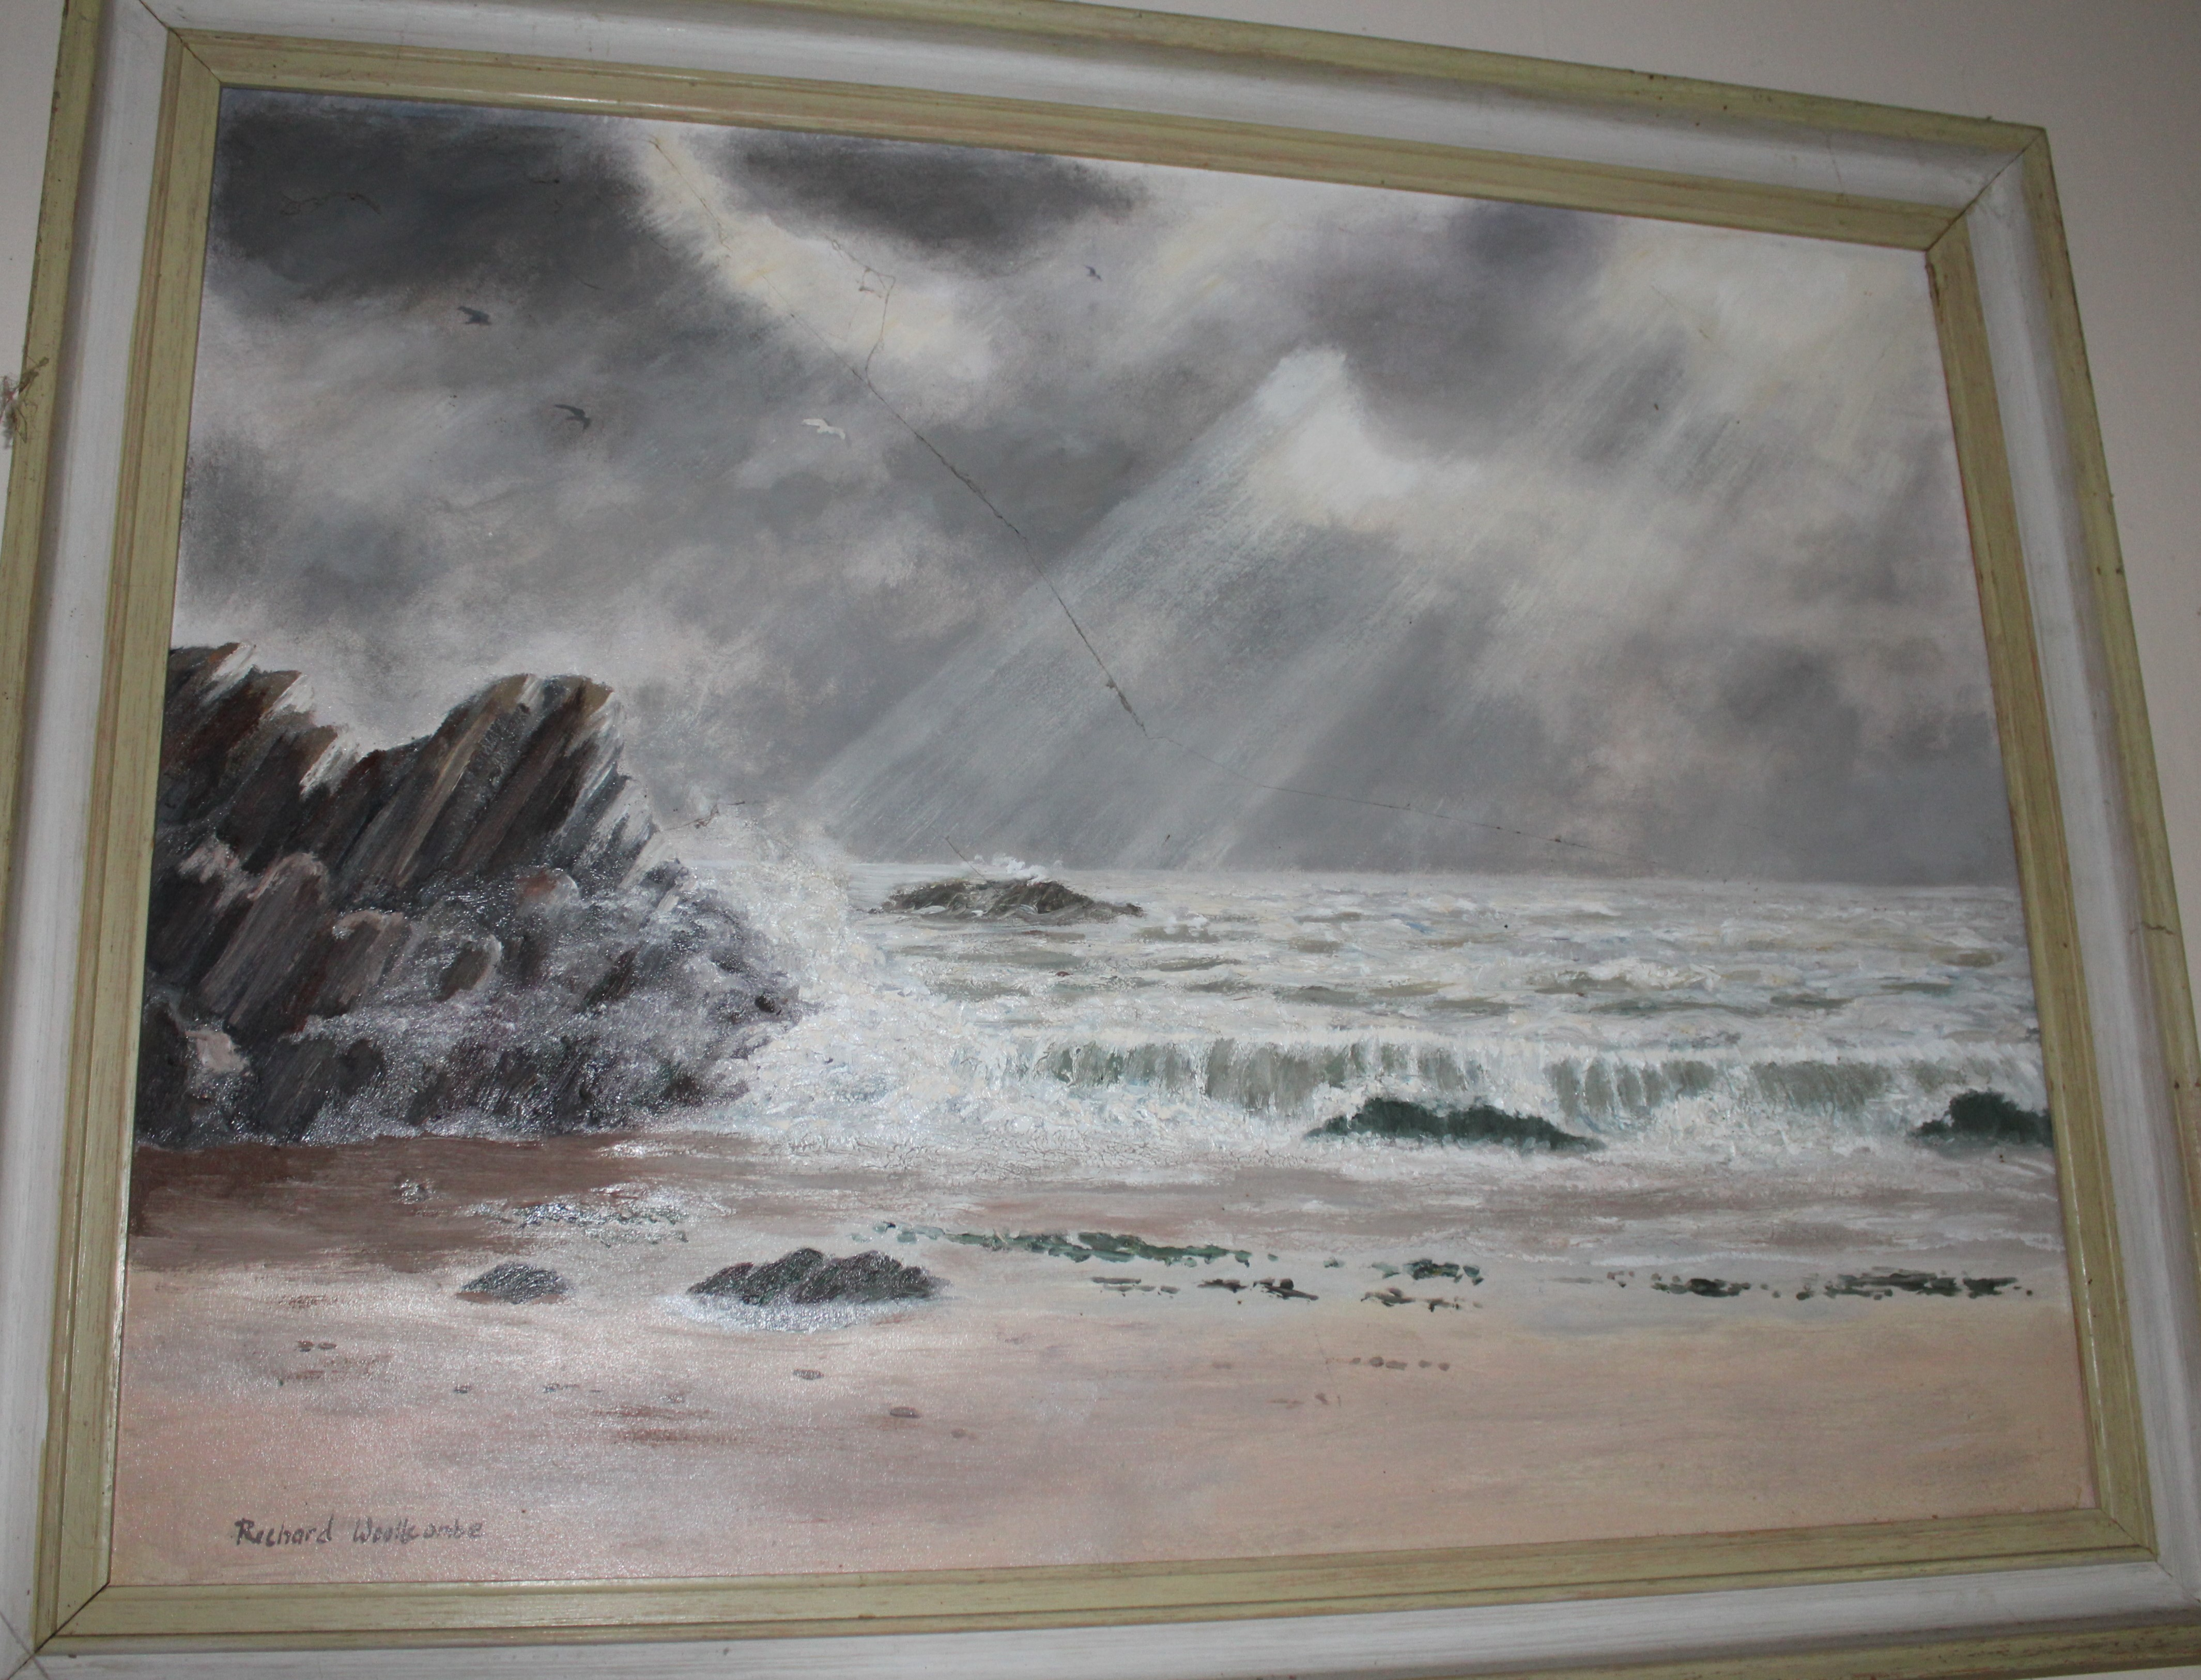 •WAVES BREAKING ON A ROCKY BEACH Signed framed oil on board, 45 x 59cm.